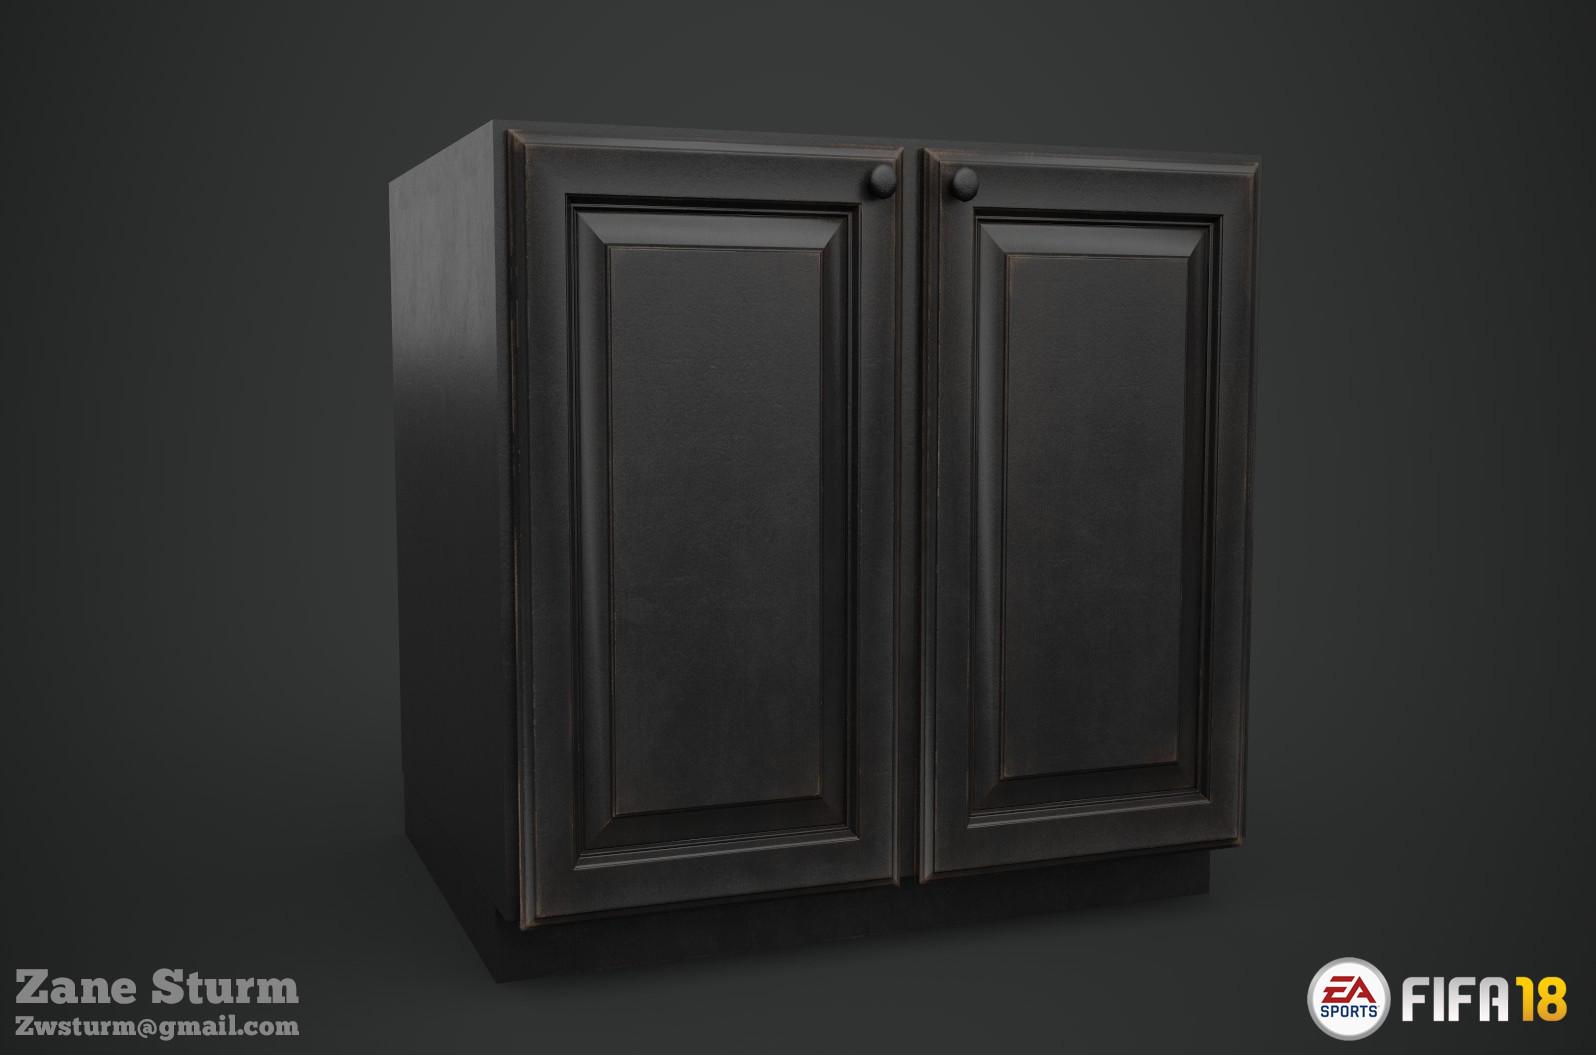 Zane sturm cabinet